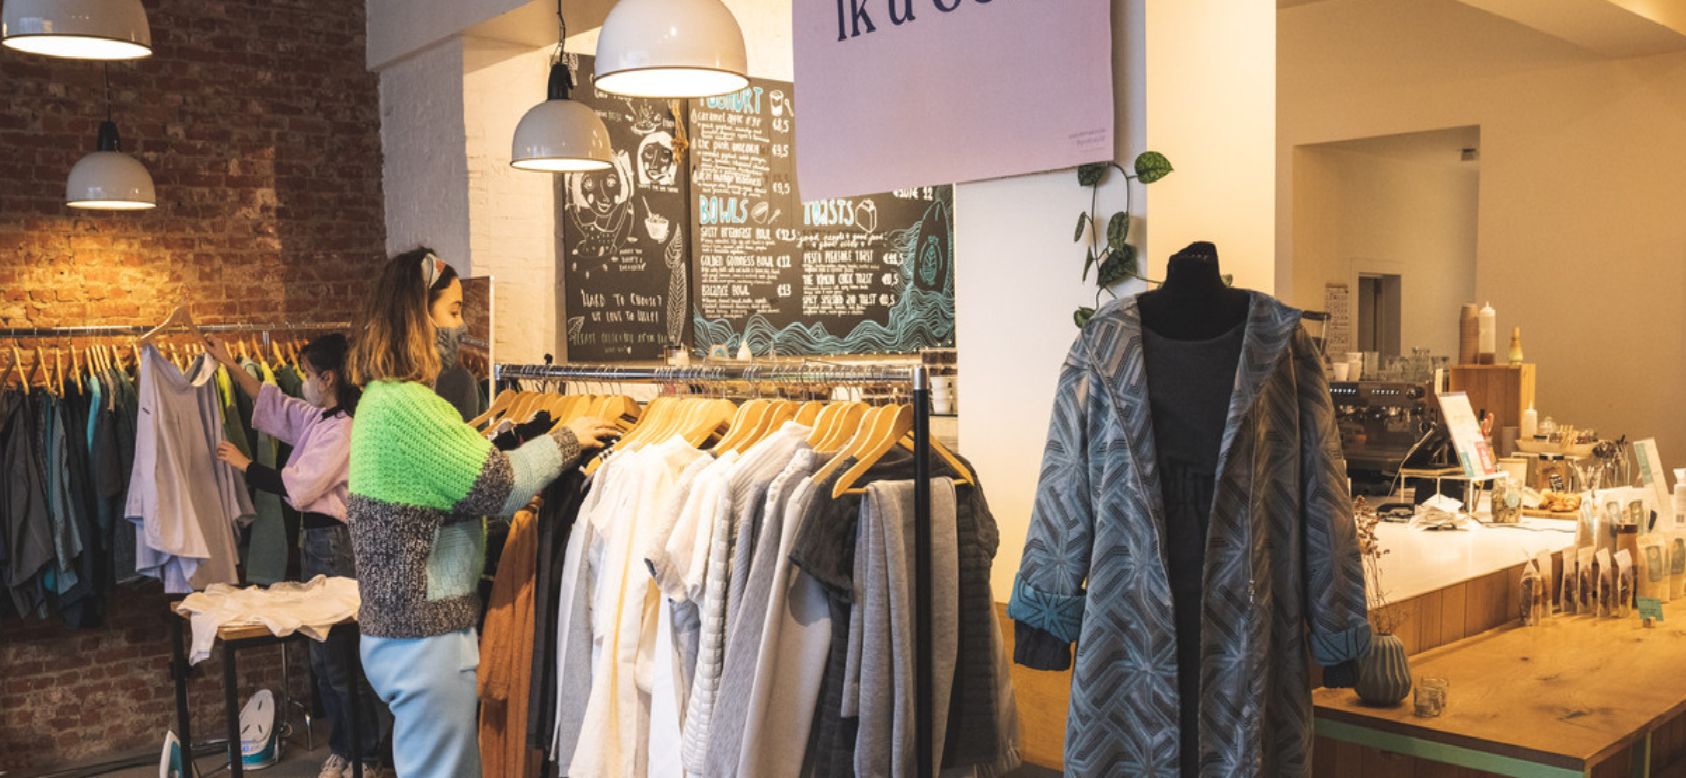 Gent ondernemer pop-up duurzame kledij